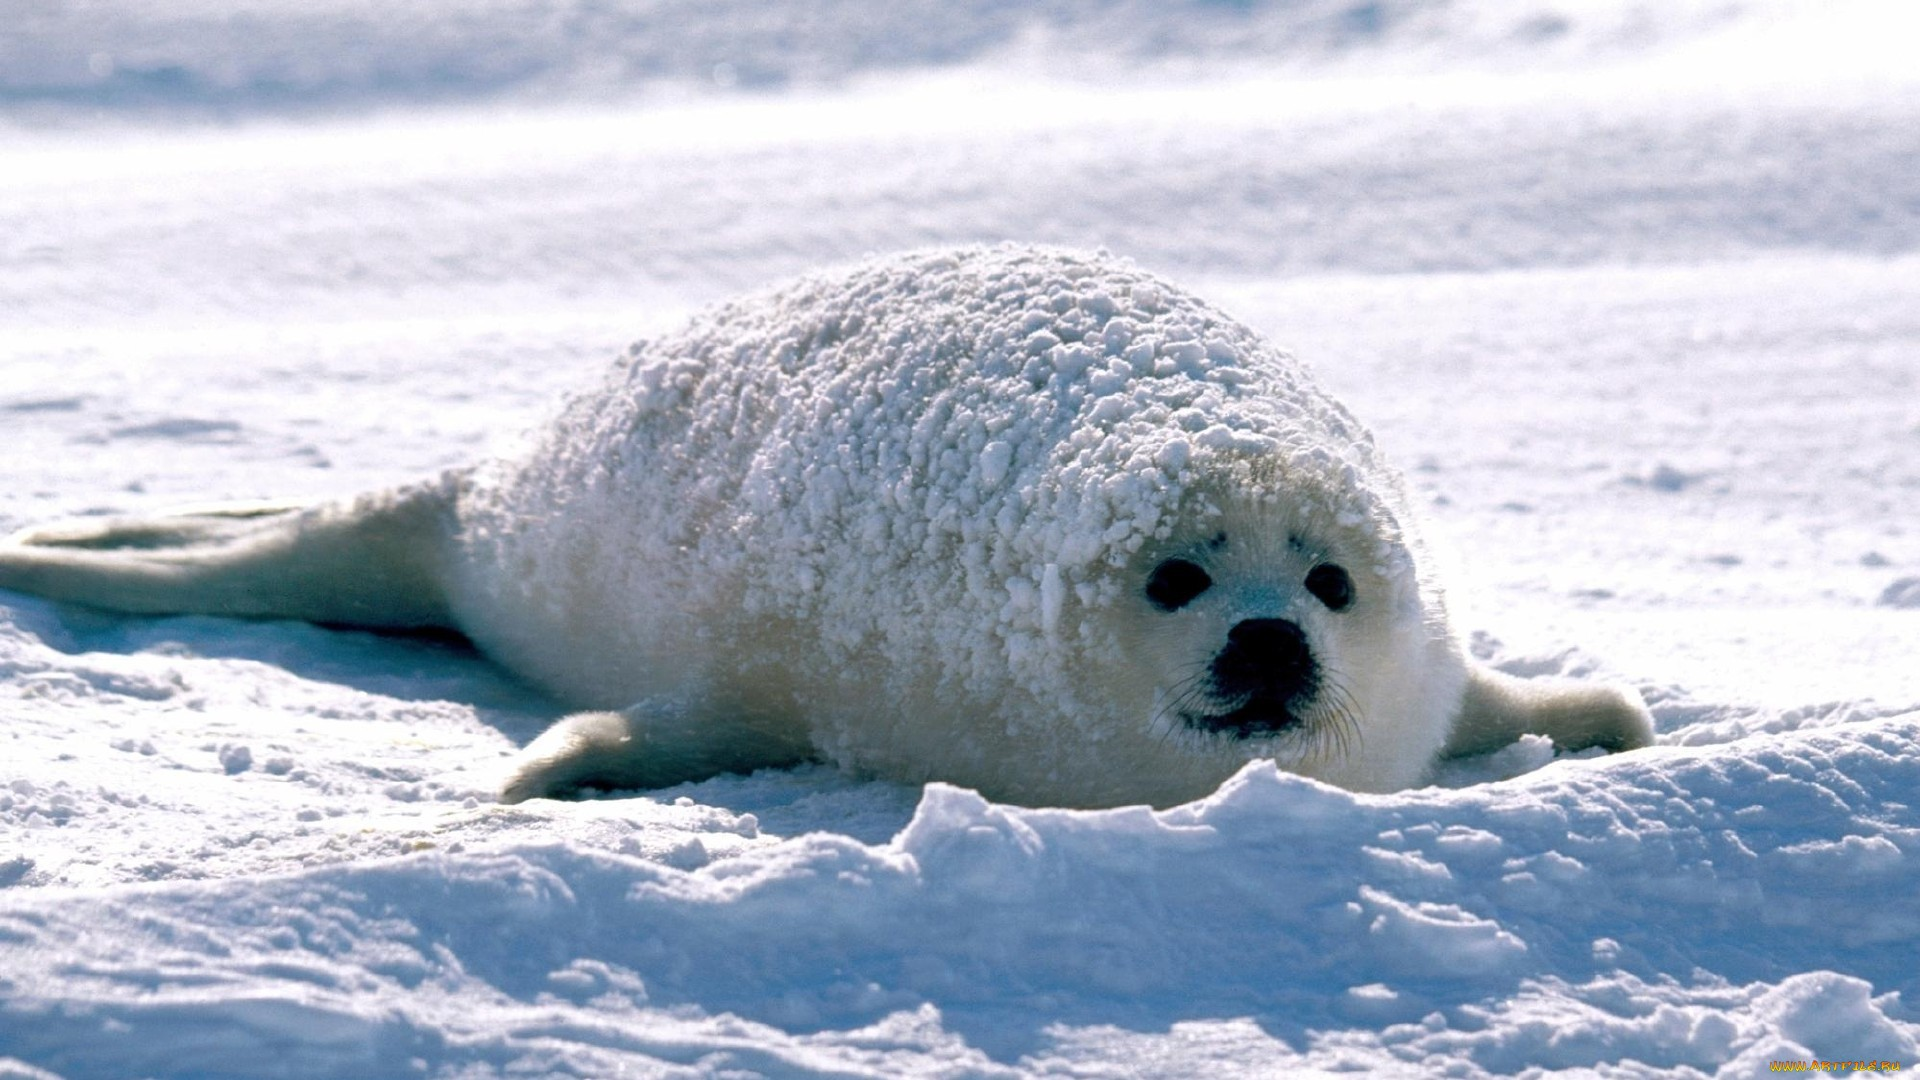 Seal wallpaper photo